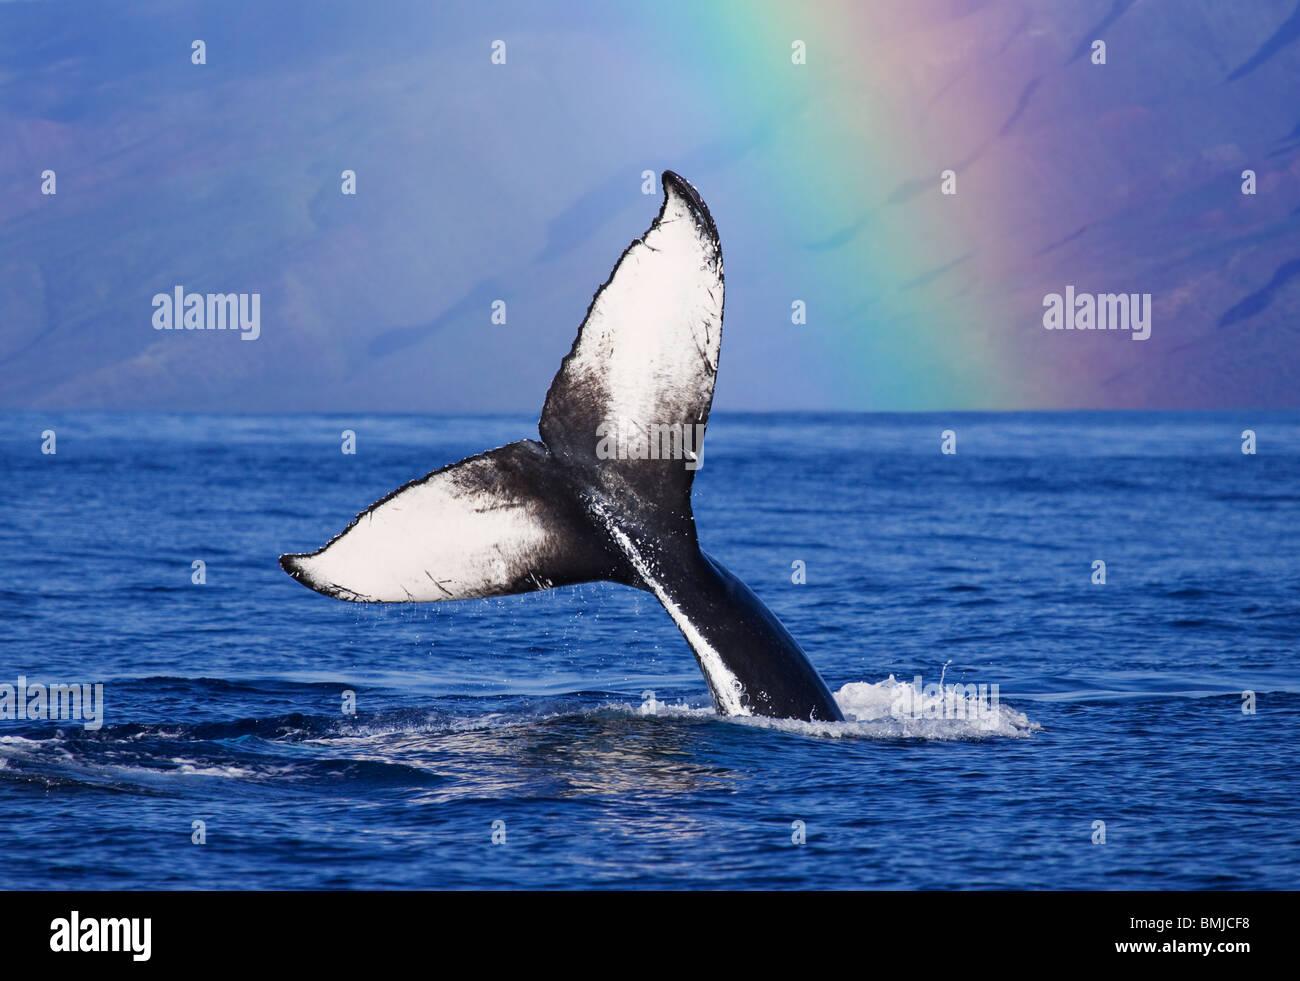 Queue de baleine à bosse avec rainbow, Molokai, Hawaï. Photo Stock